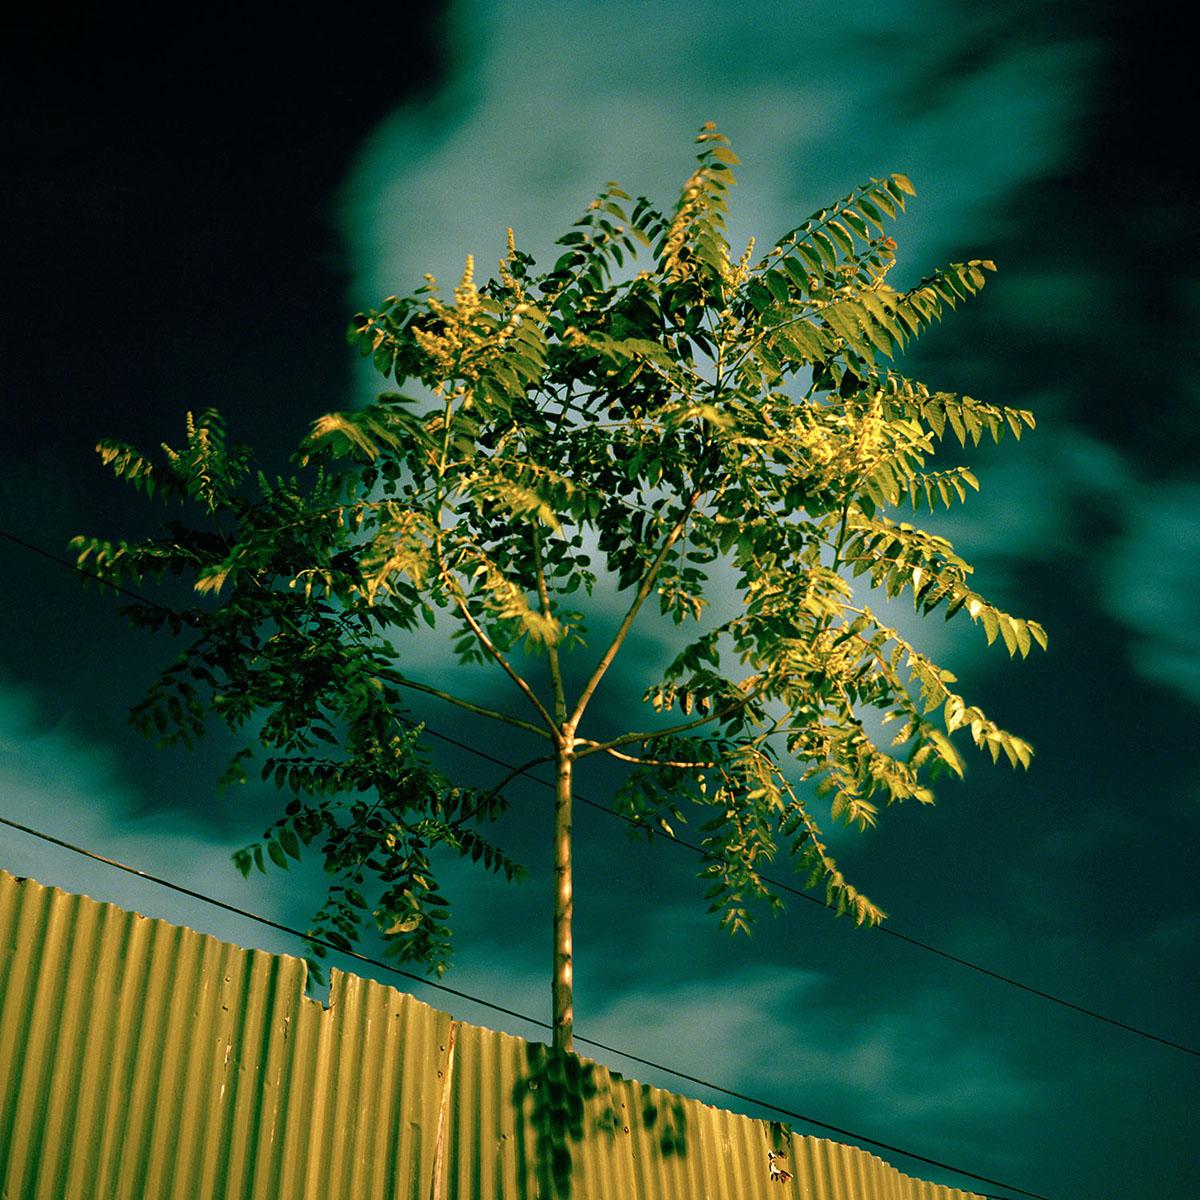 08-Draskoczy-CorrugatedTree.jpg